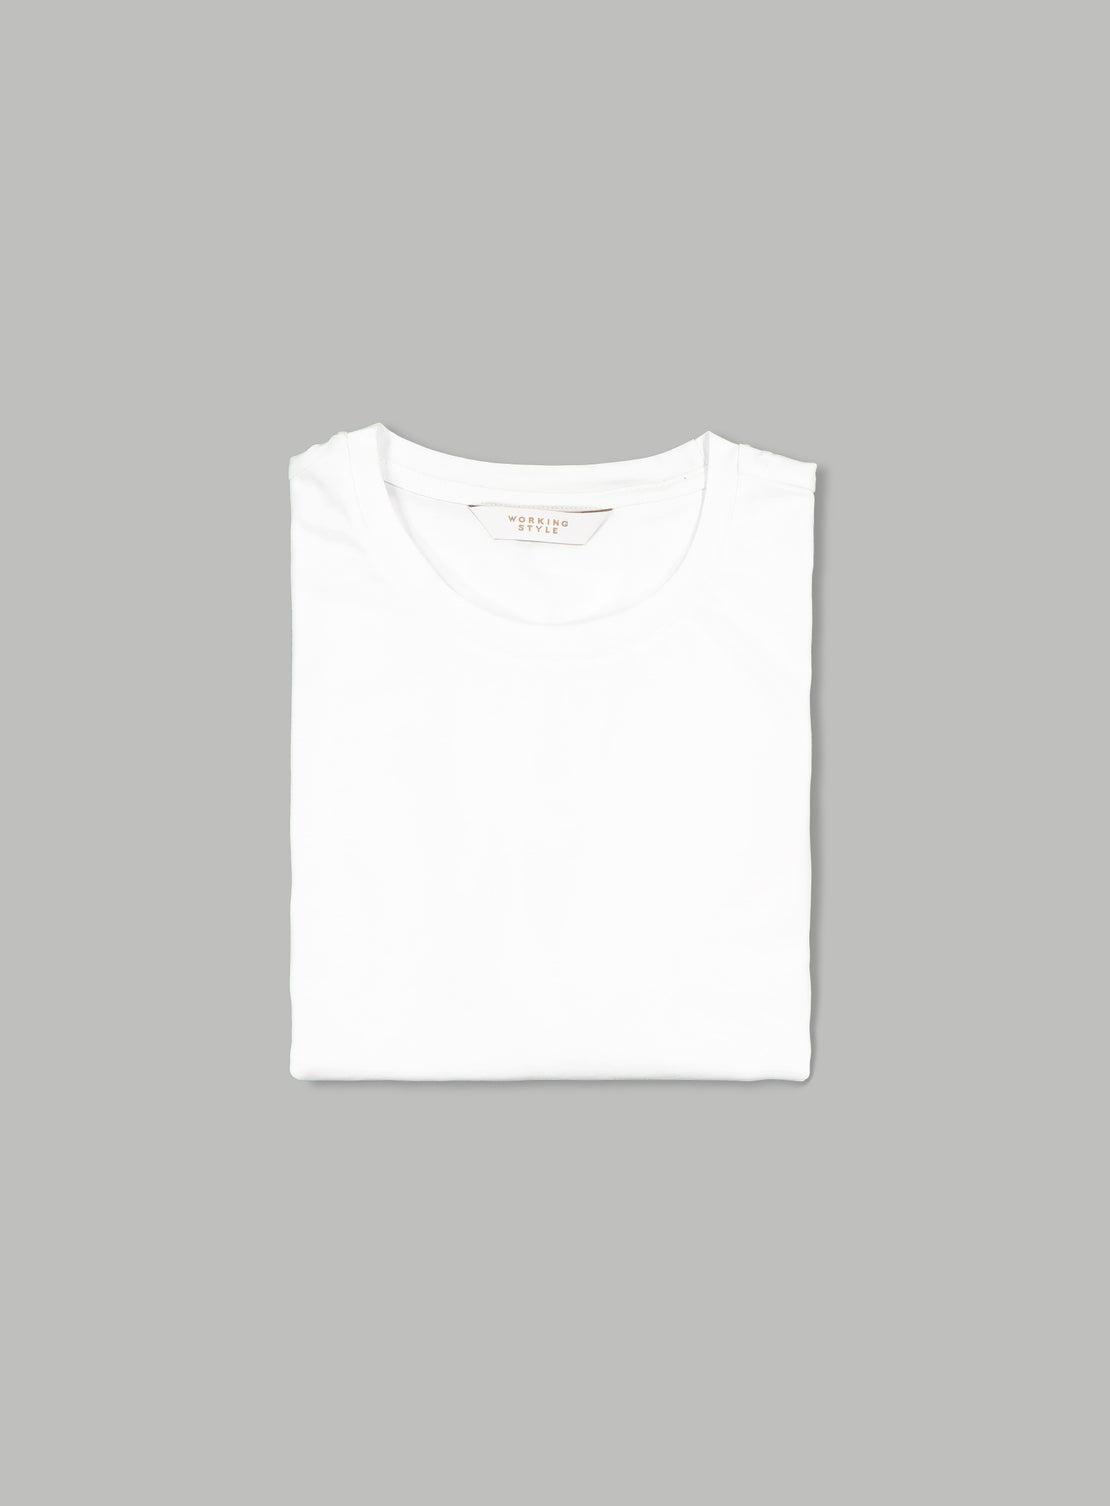 Benny White T-Shirt